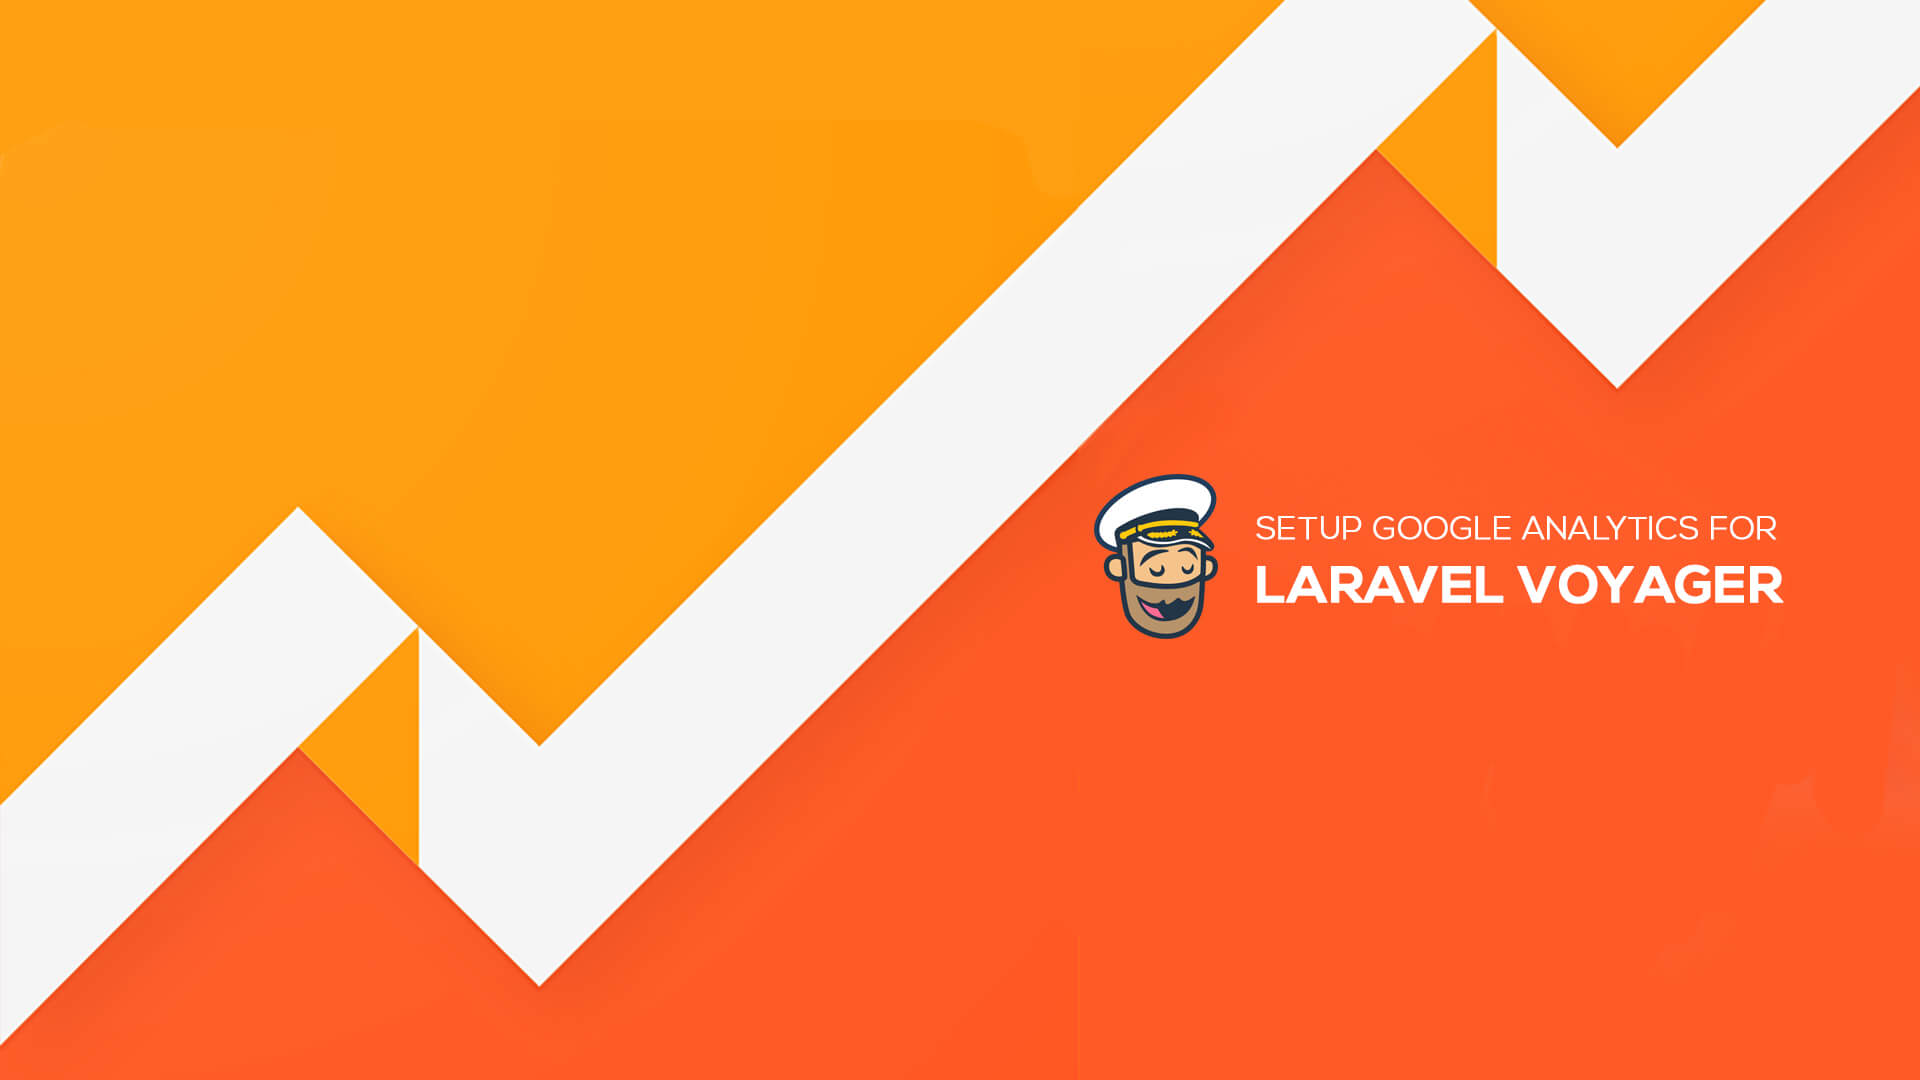 Setup Google Analytics for Laravel Voyager